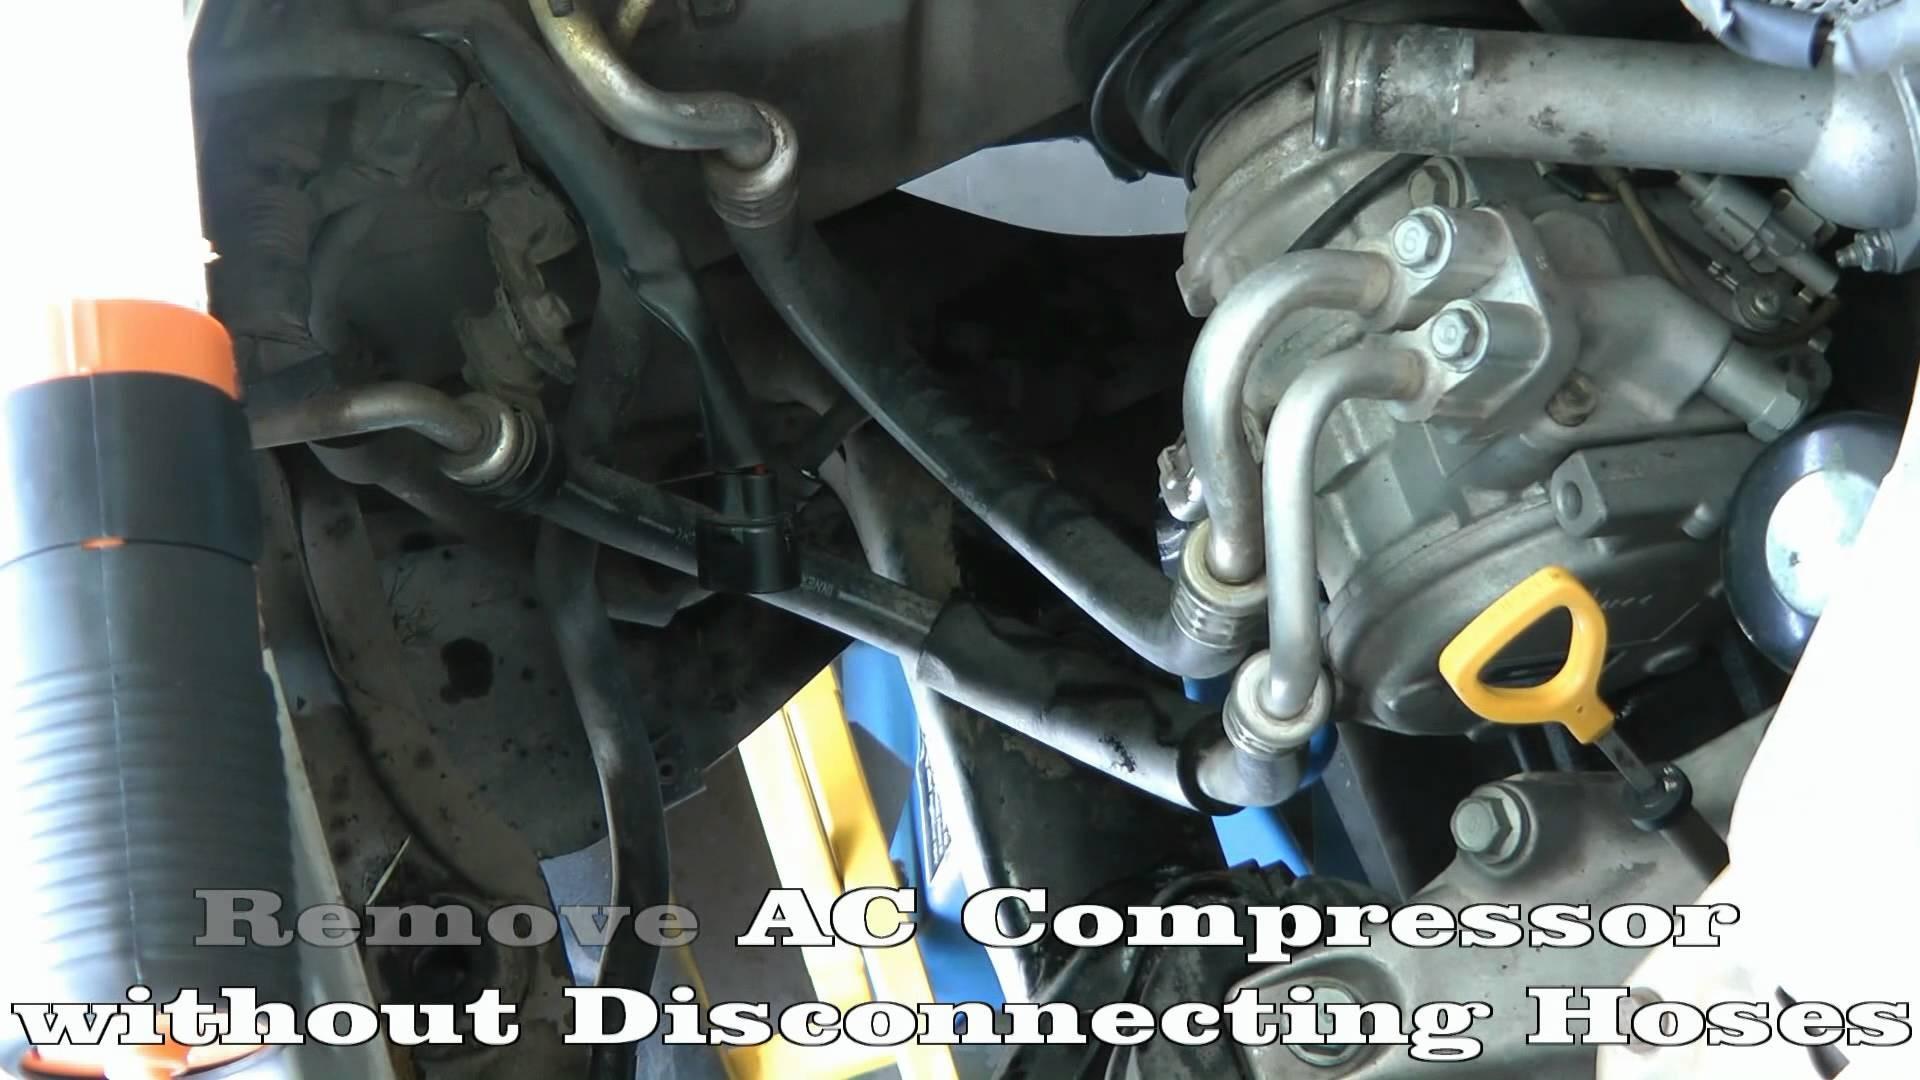 2004 toyota Camry Engine Diagram Part 1 Of 10 Remove Engine & Tranny Rebuild 1994 toyota Camry Of 2004 toyota Camry Engine Diagram